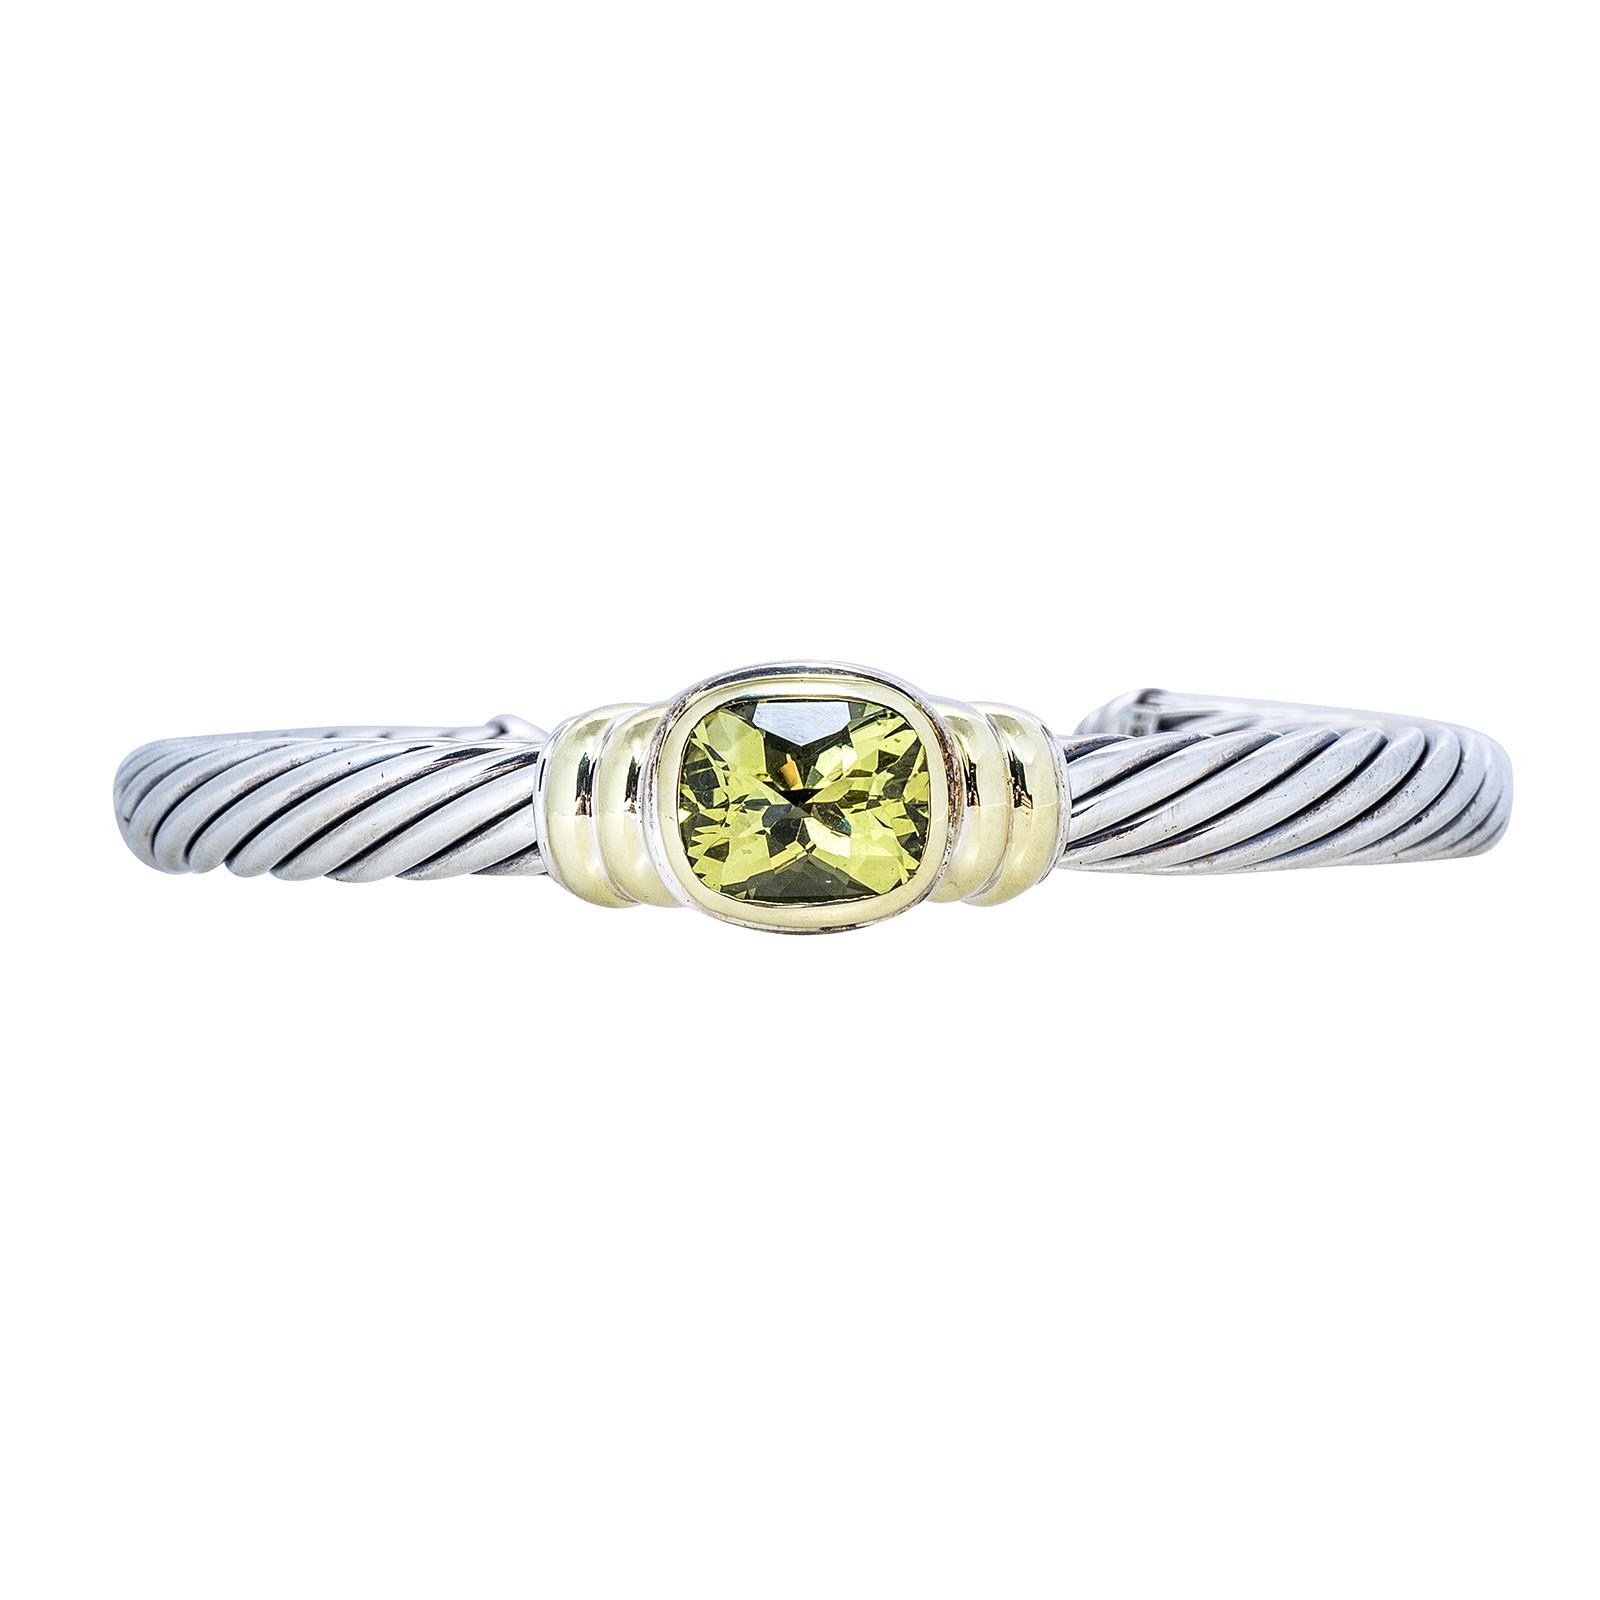 Vintage David Yurman Lemon Quartz Noblesse Bracelet